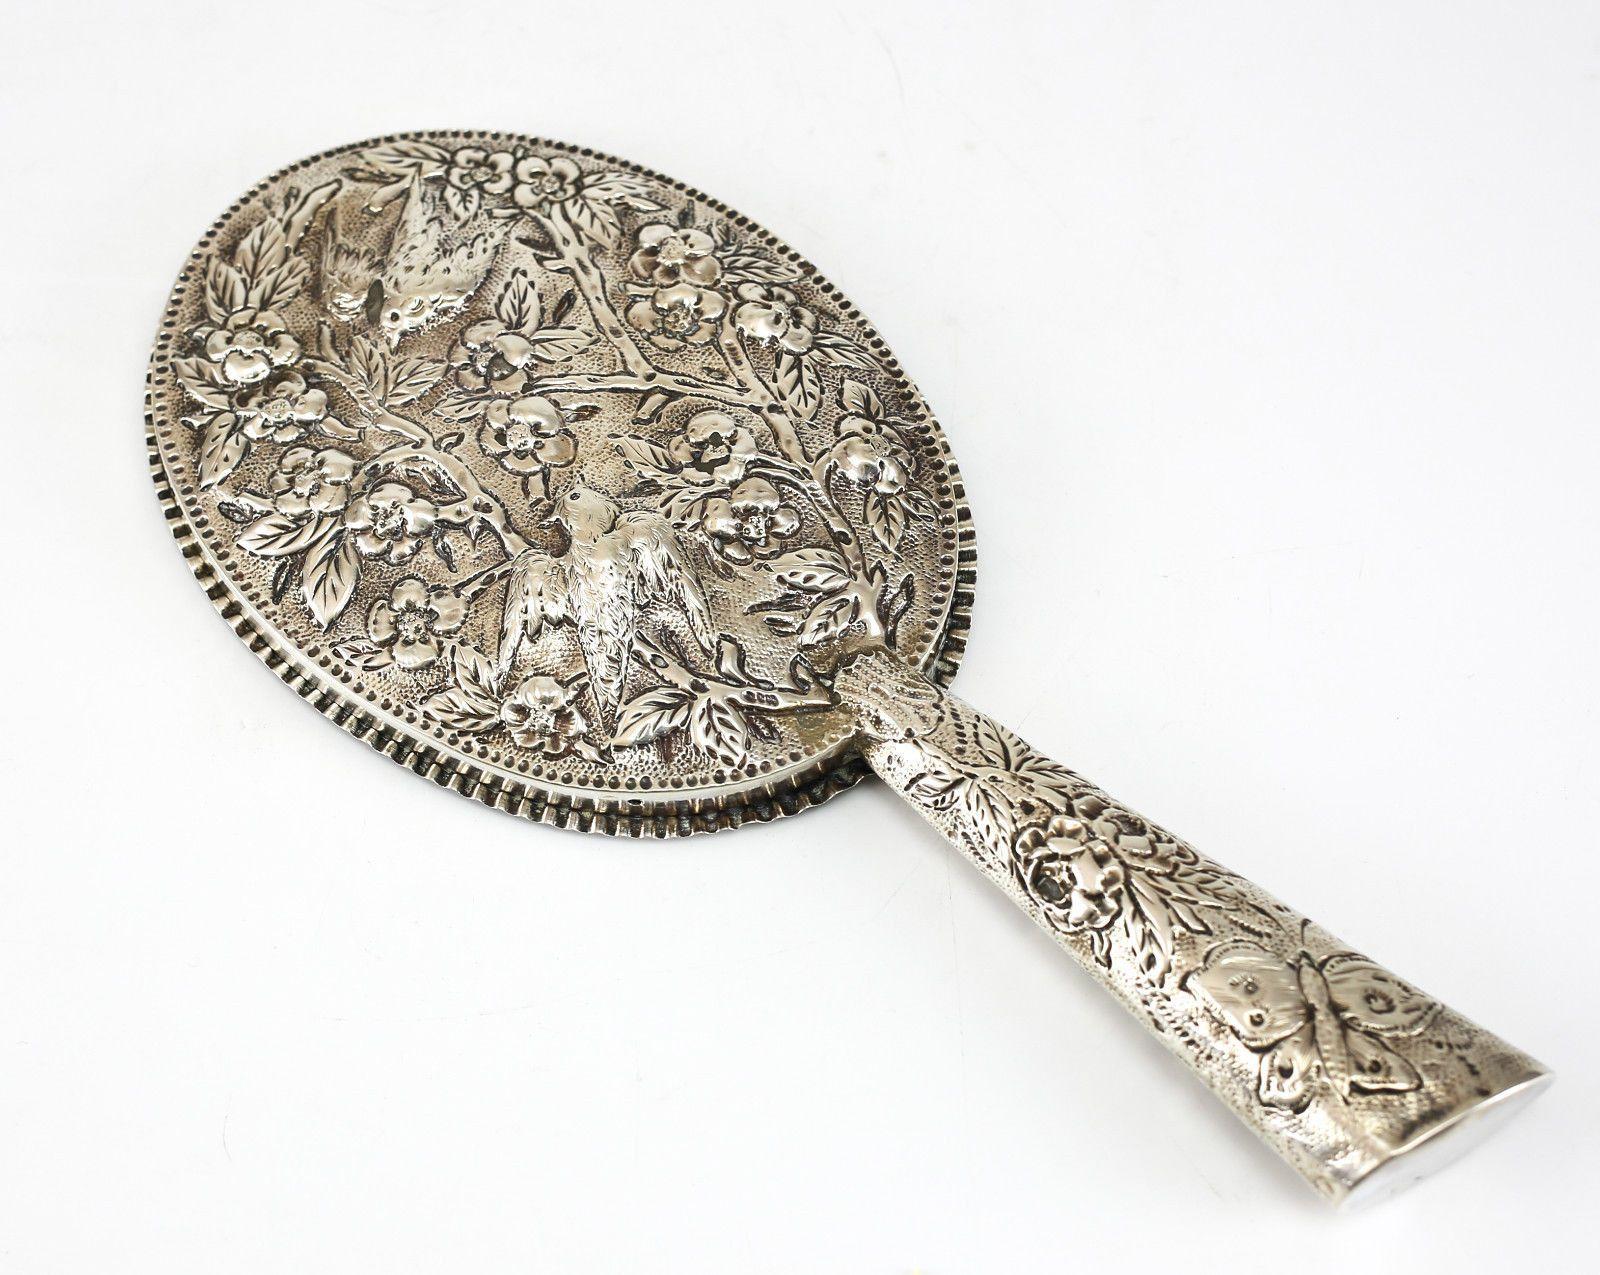 Rosenthal Jacob Co Birmingham Sterling Silver Hand Mirror